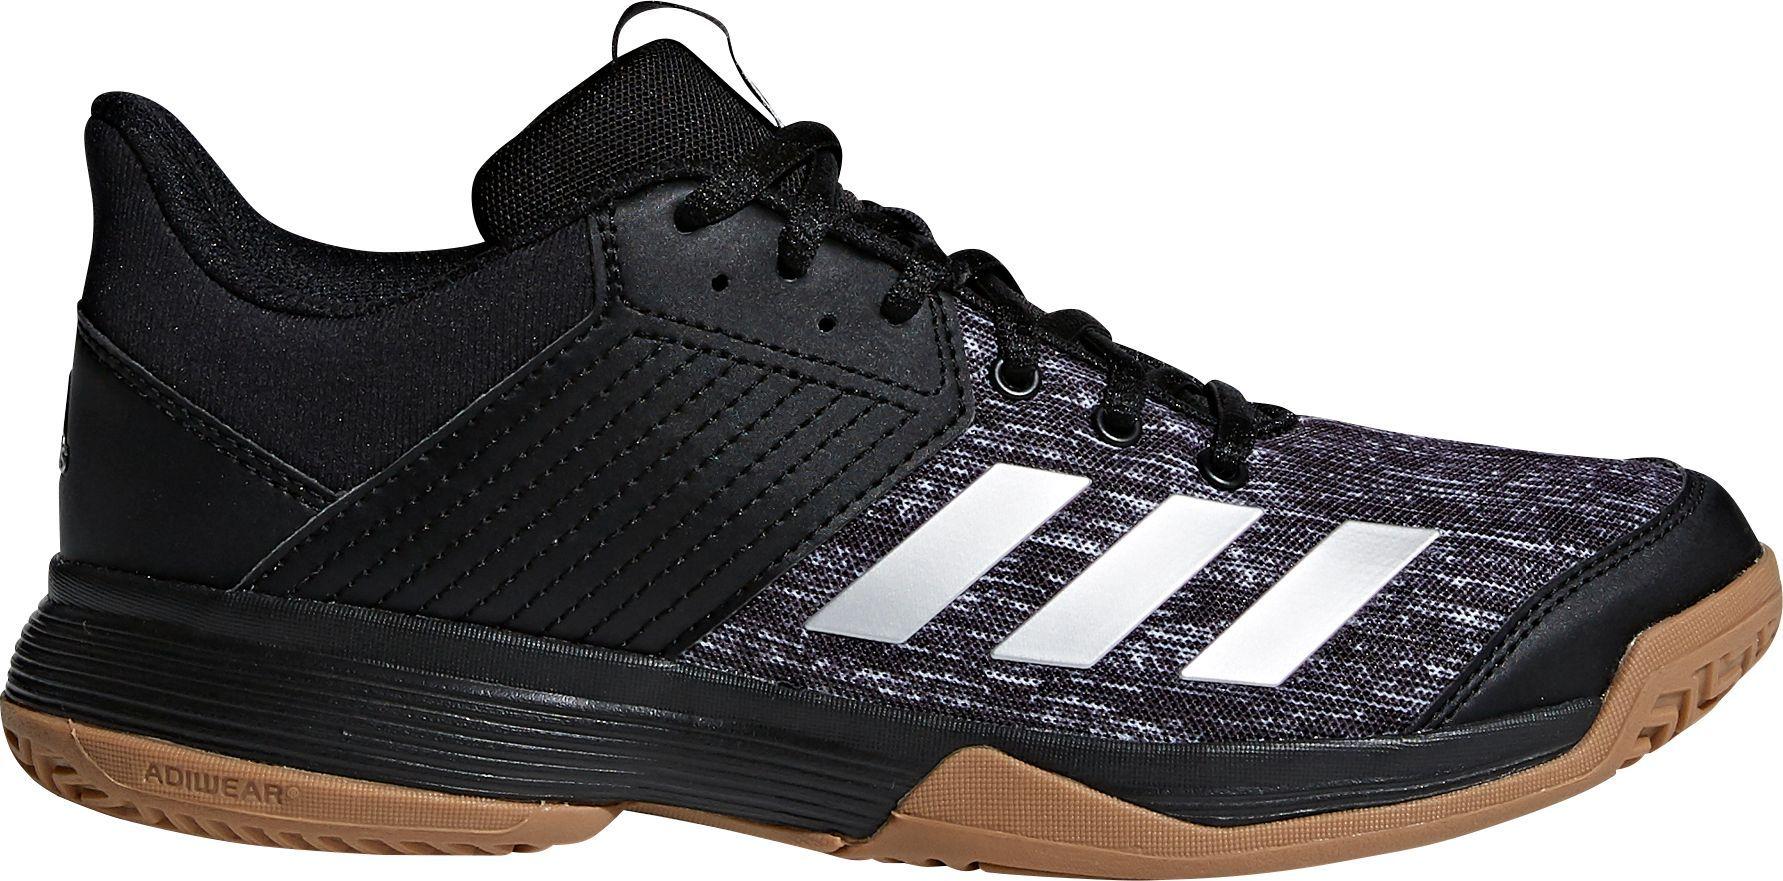 Adidas Women S Ligra 6 Volleyball Shoes Black Volleyball Shoes Adidas Volleyball Shoes Adidas Women